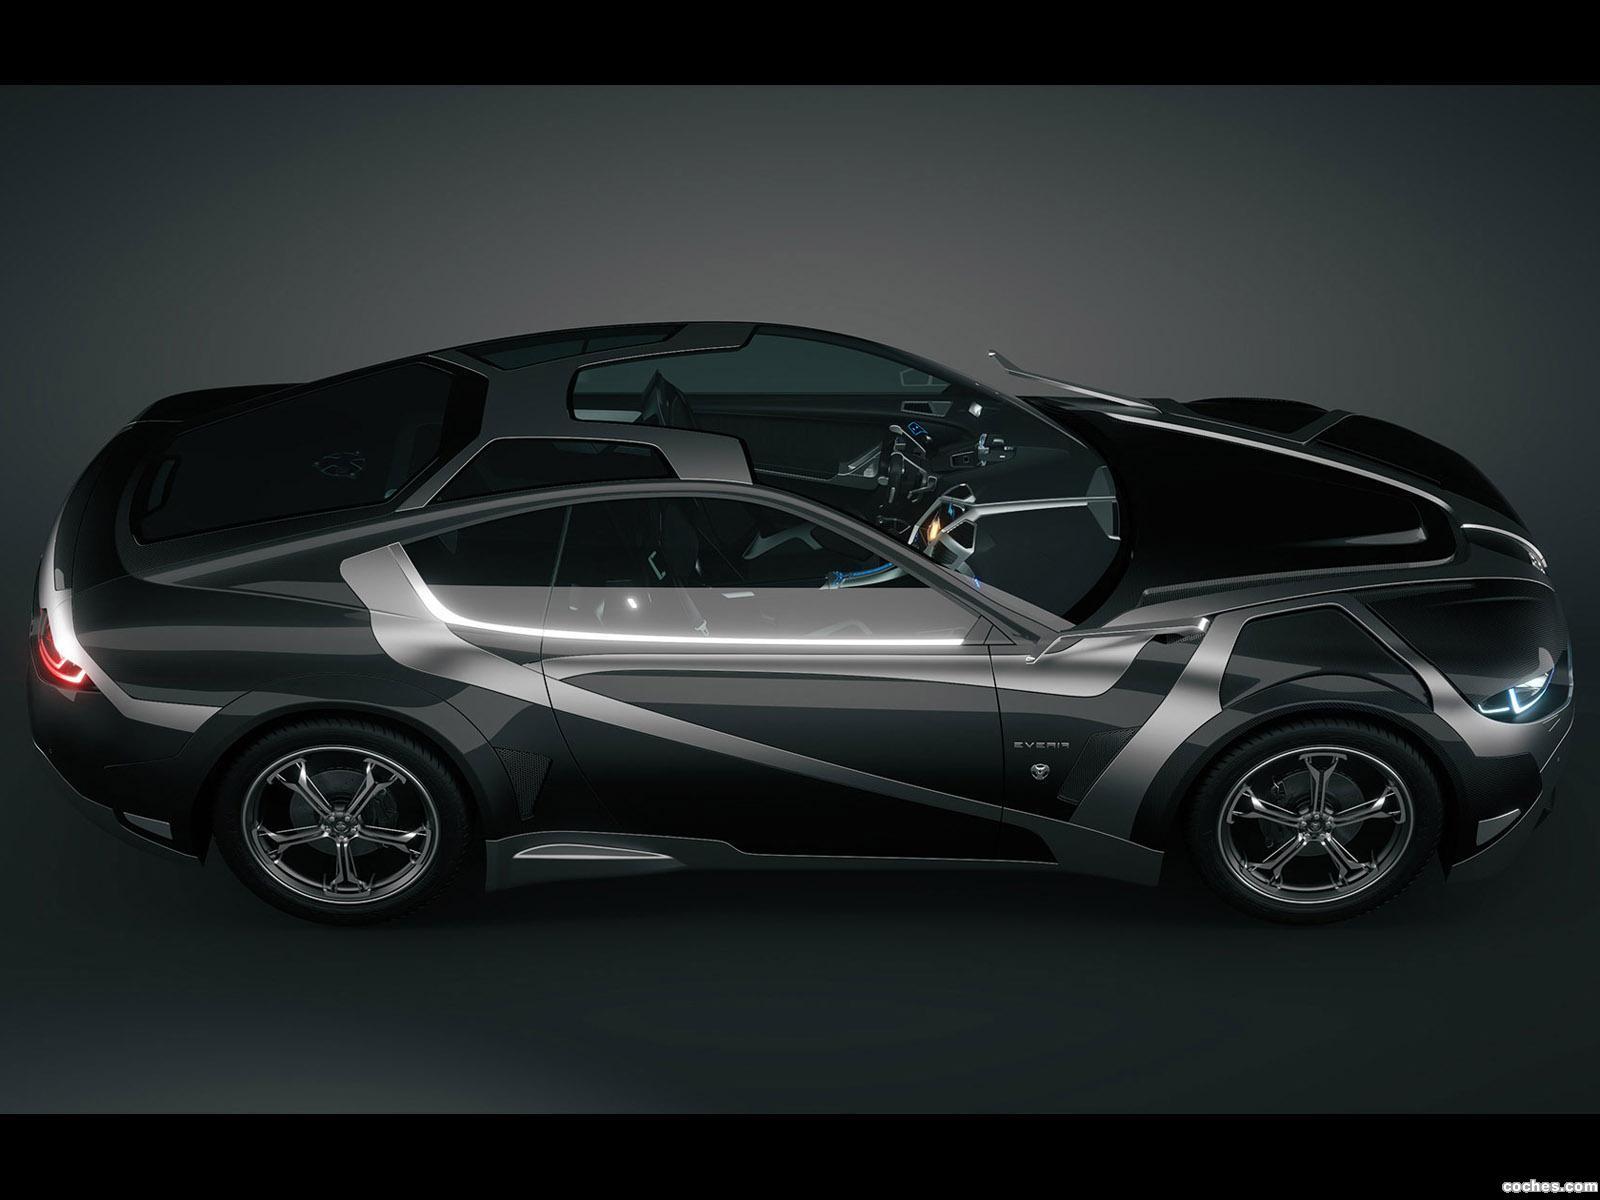 Foto 4 de Tronatic Everia Concept 2012